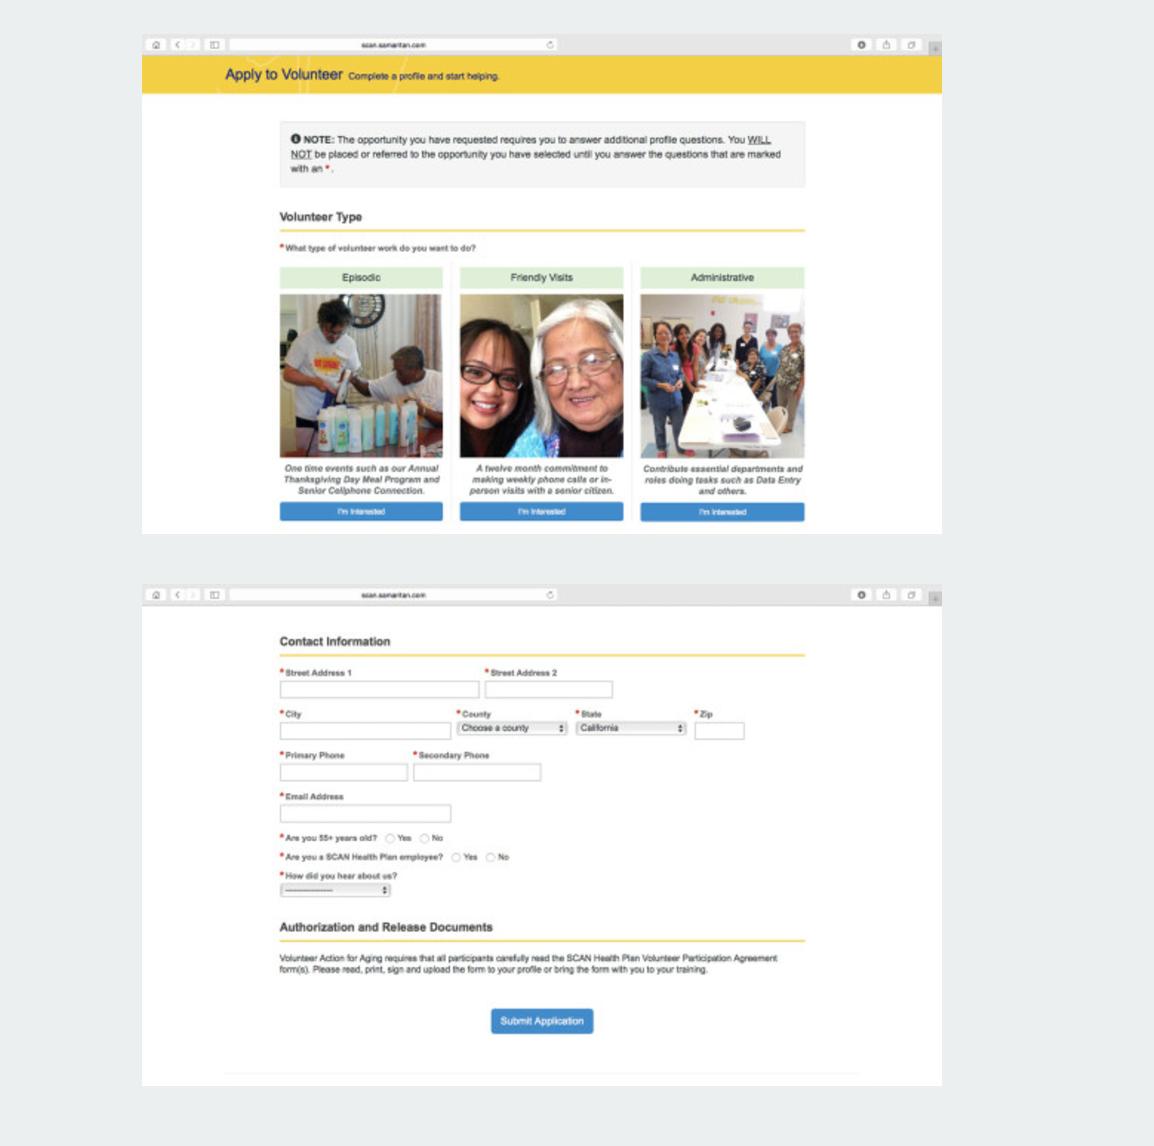 eCoordinator apply for volunteer program